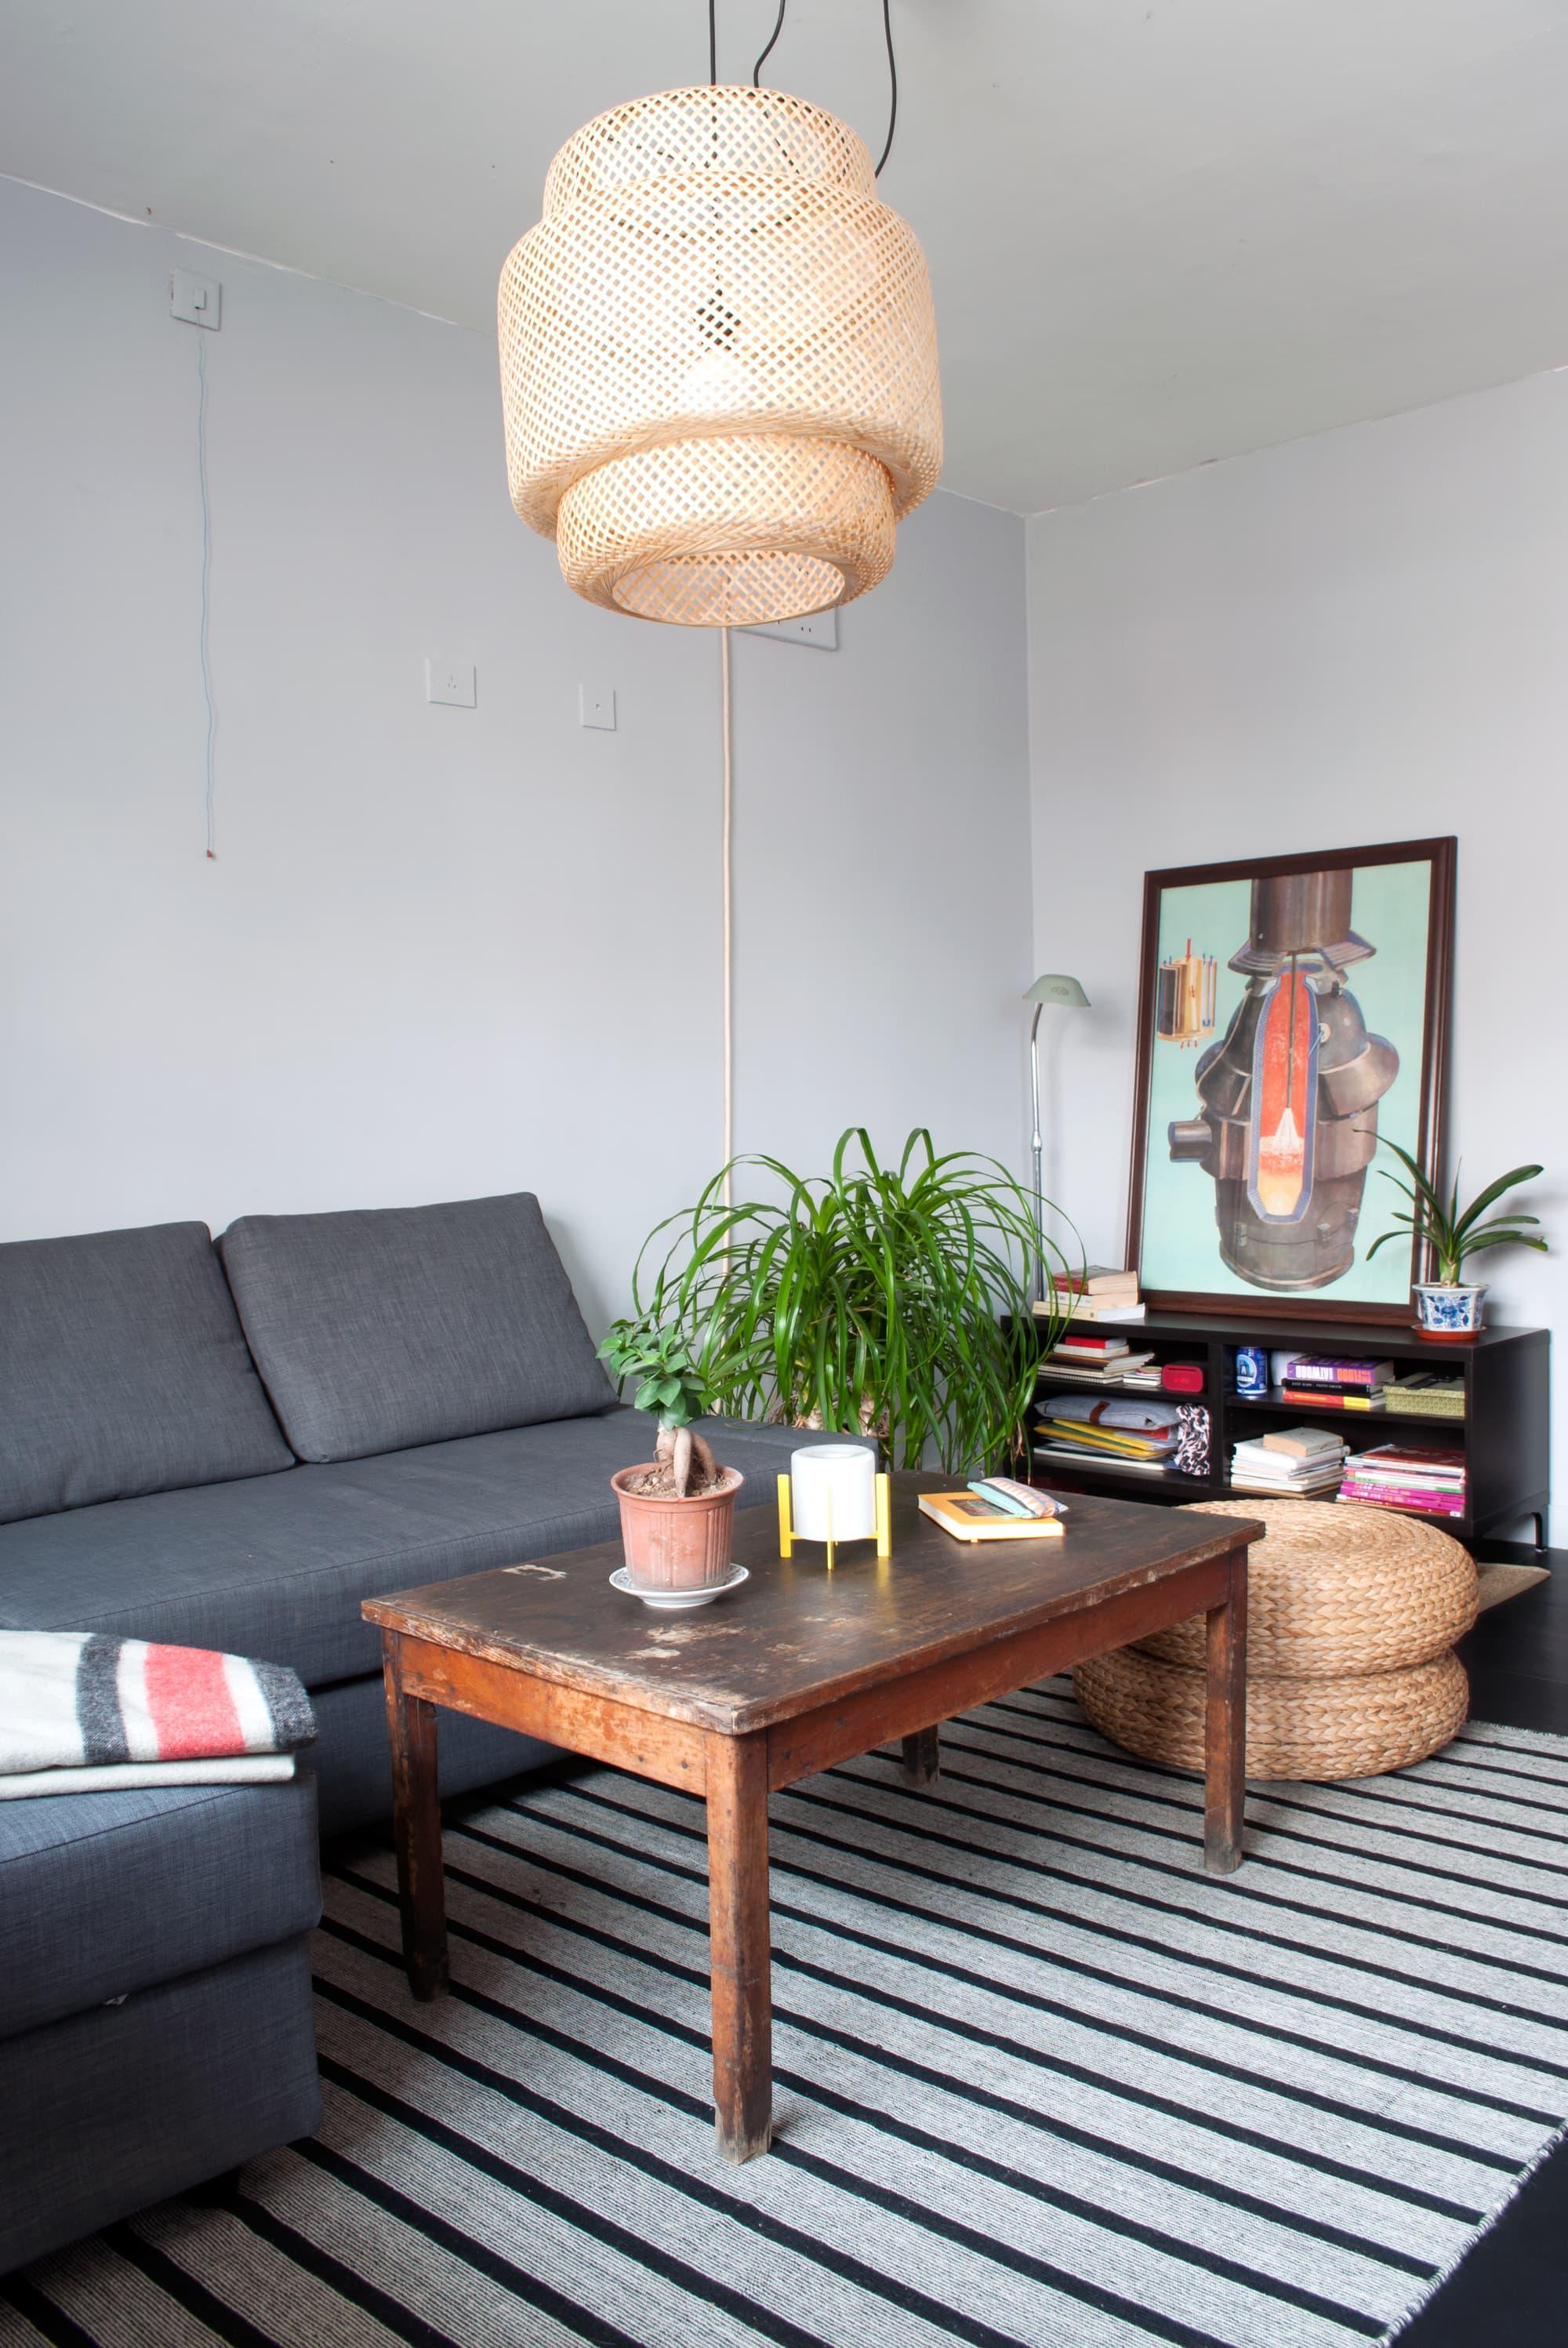 The Pendant Is The Best Budget Ikea Light Iikea Sinnerlig Pendant Light Apartment Therapy